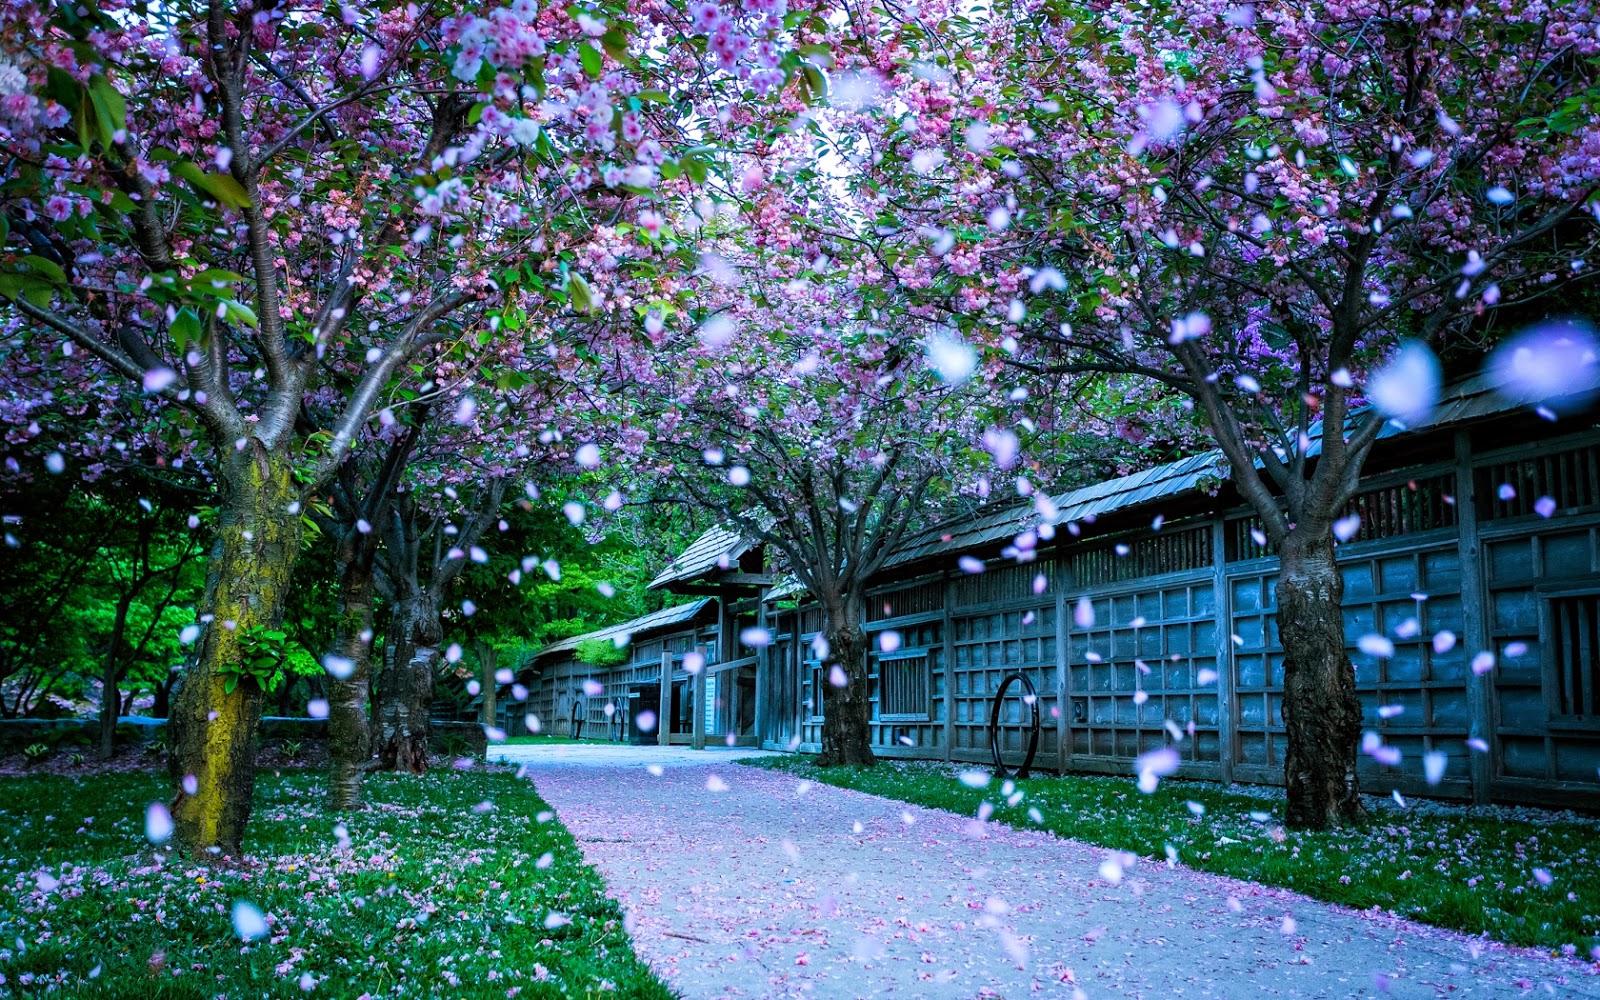 Beautiful Snow Fall Wallpaper Mobile wallpapers 1600x1000